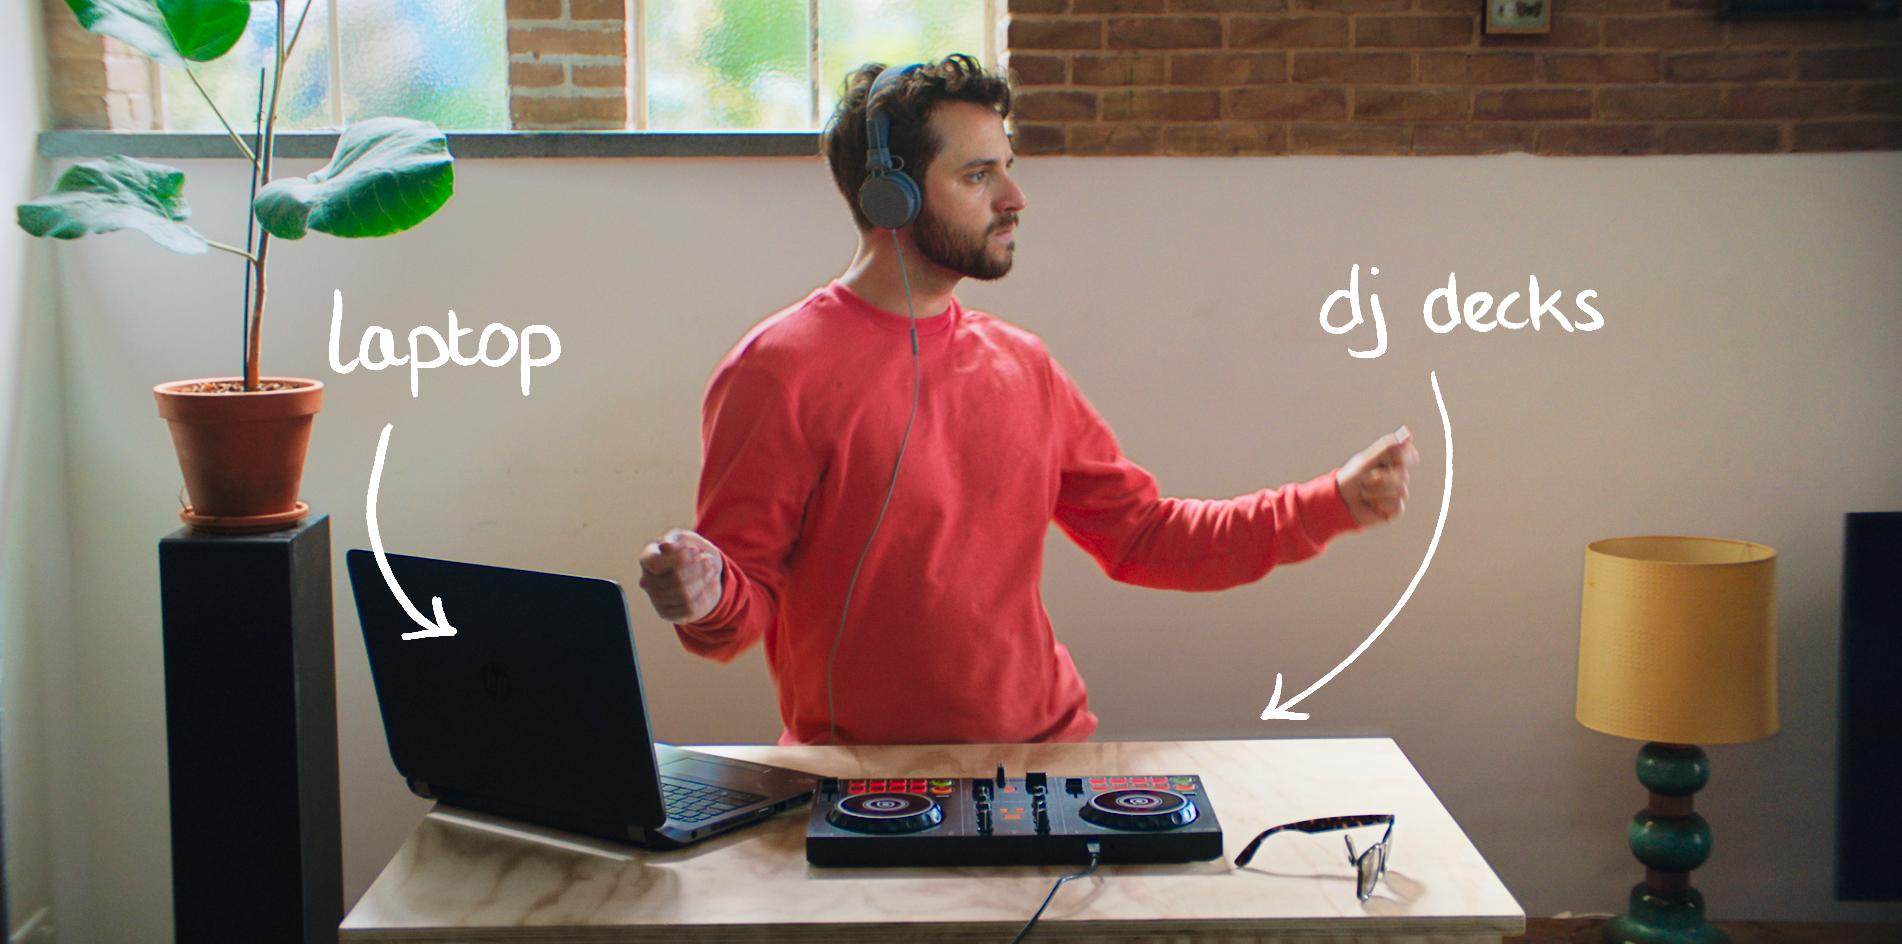 Urban-Jungle-renter-with-his-laptop-and-DJ-decks-2